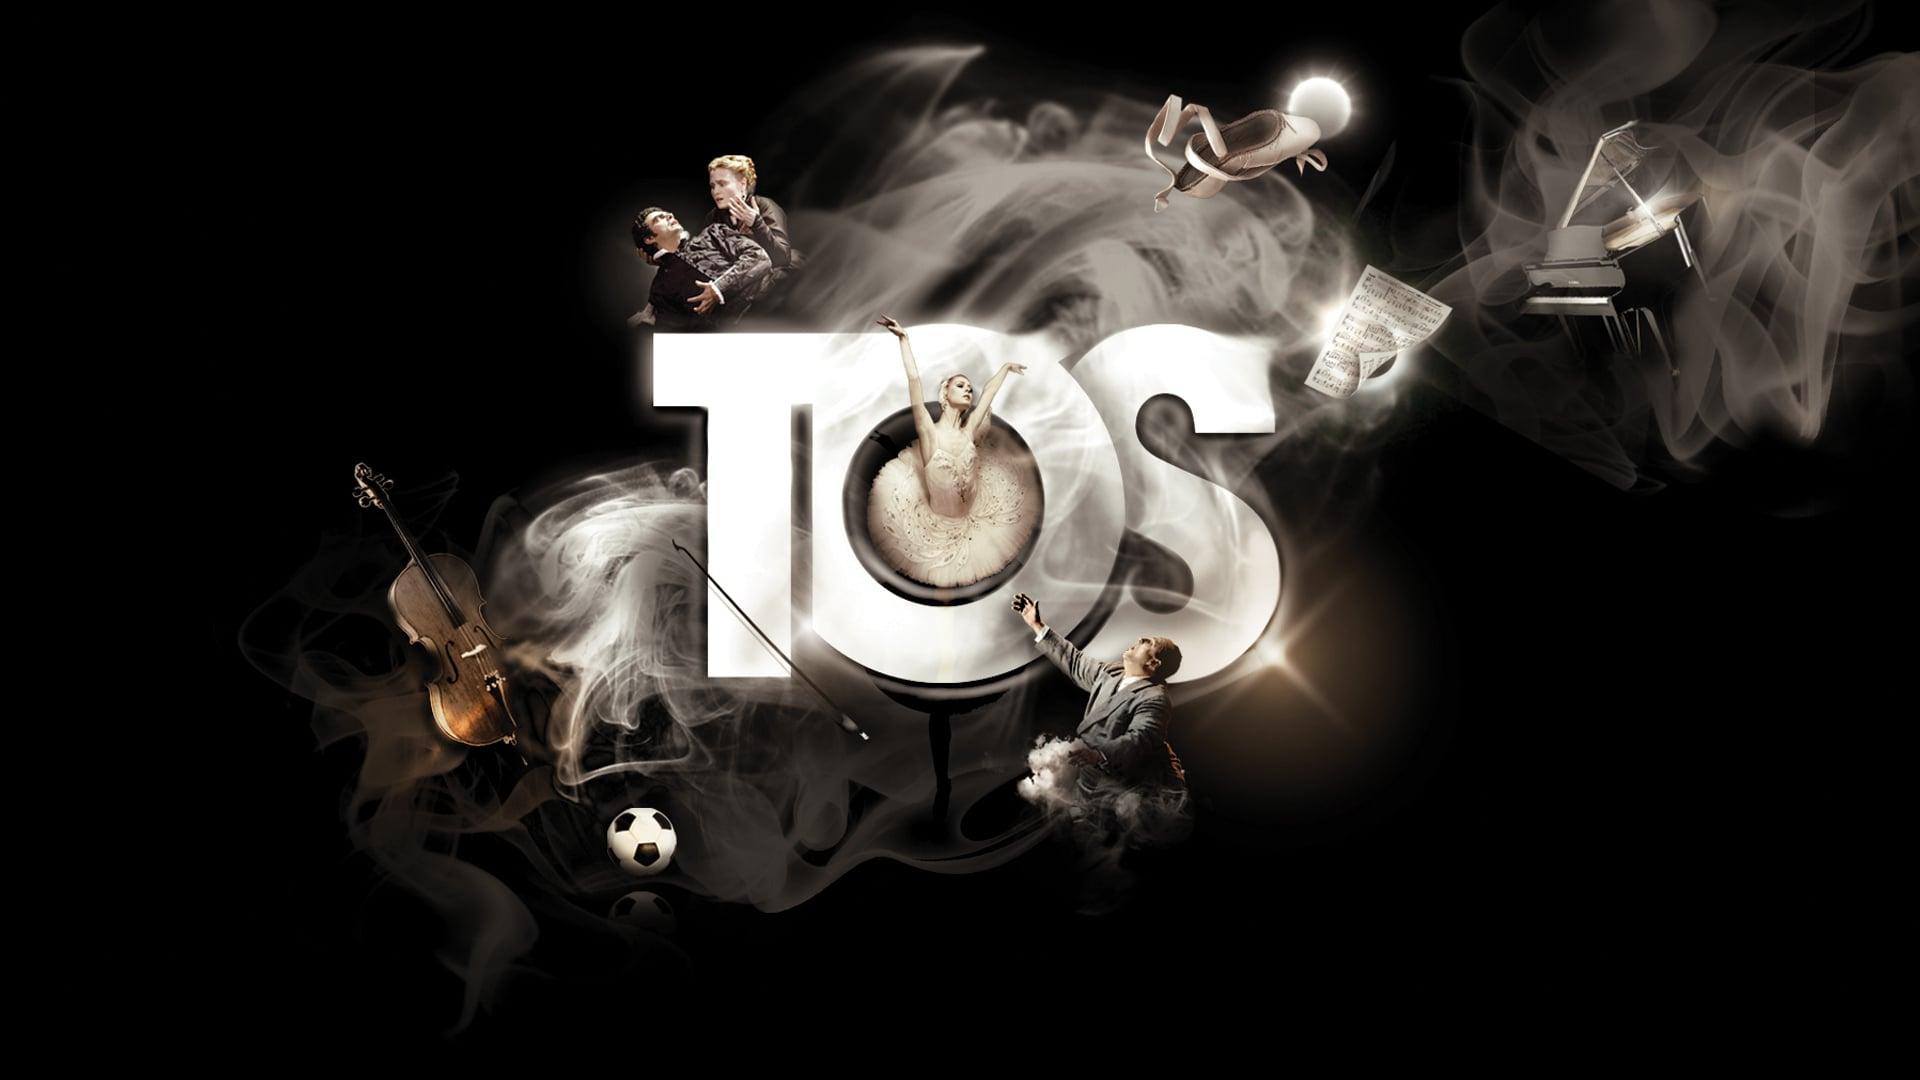 TOS TRAILER